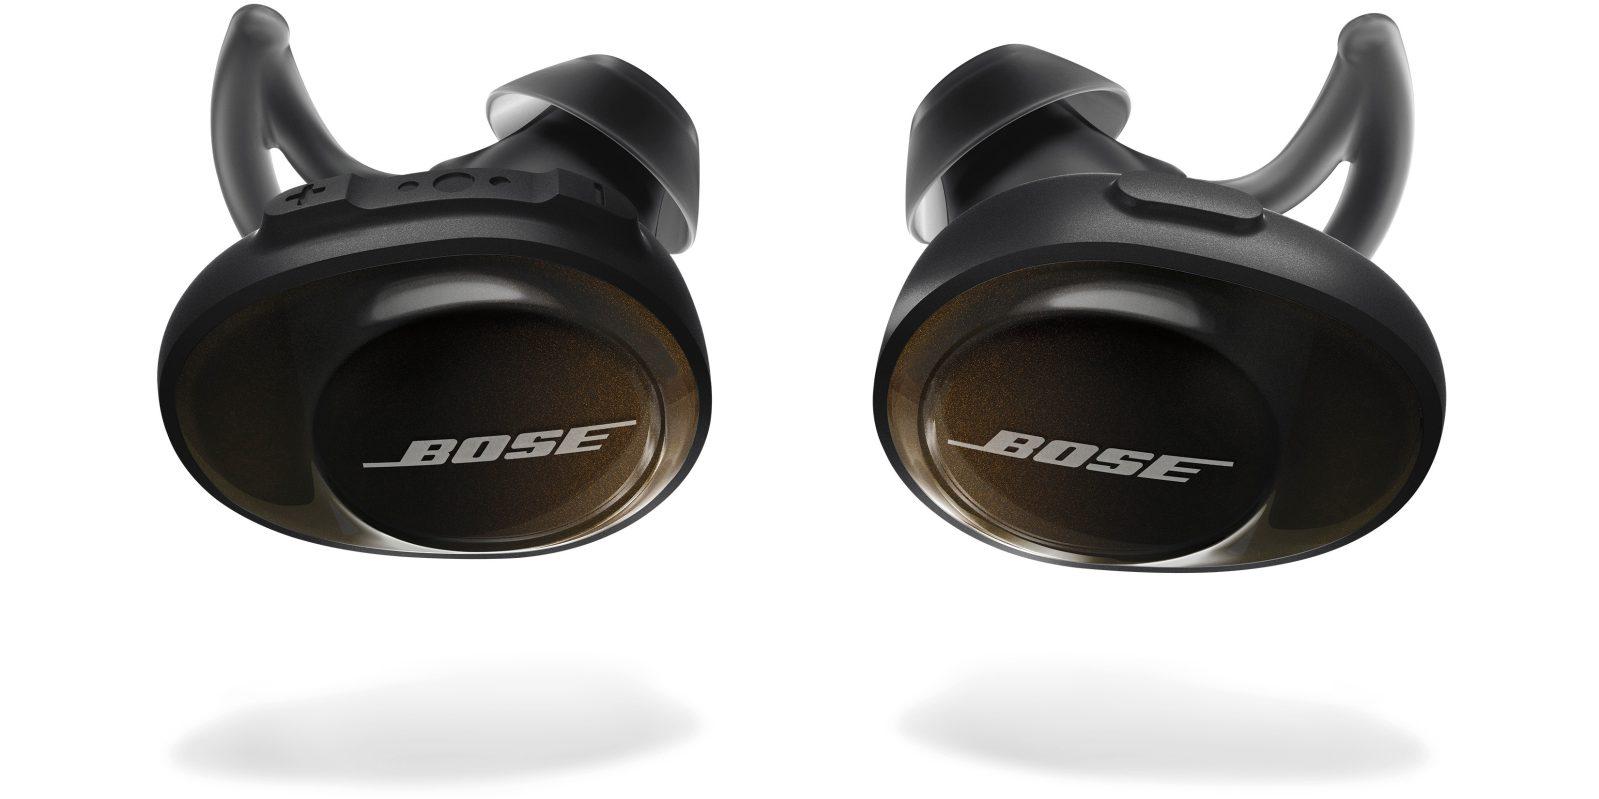 44eafc53b80c Bose refurb headphones and speakers from $81: SoundSport Free, QuietComfort  20, more